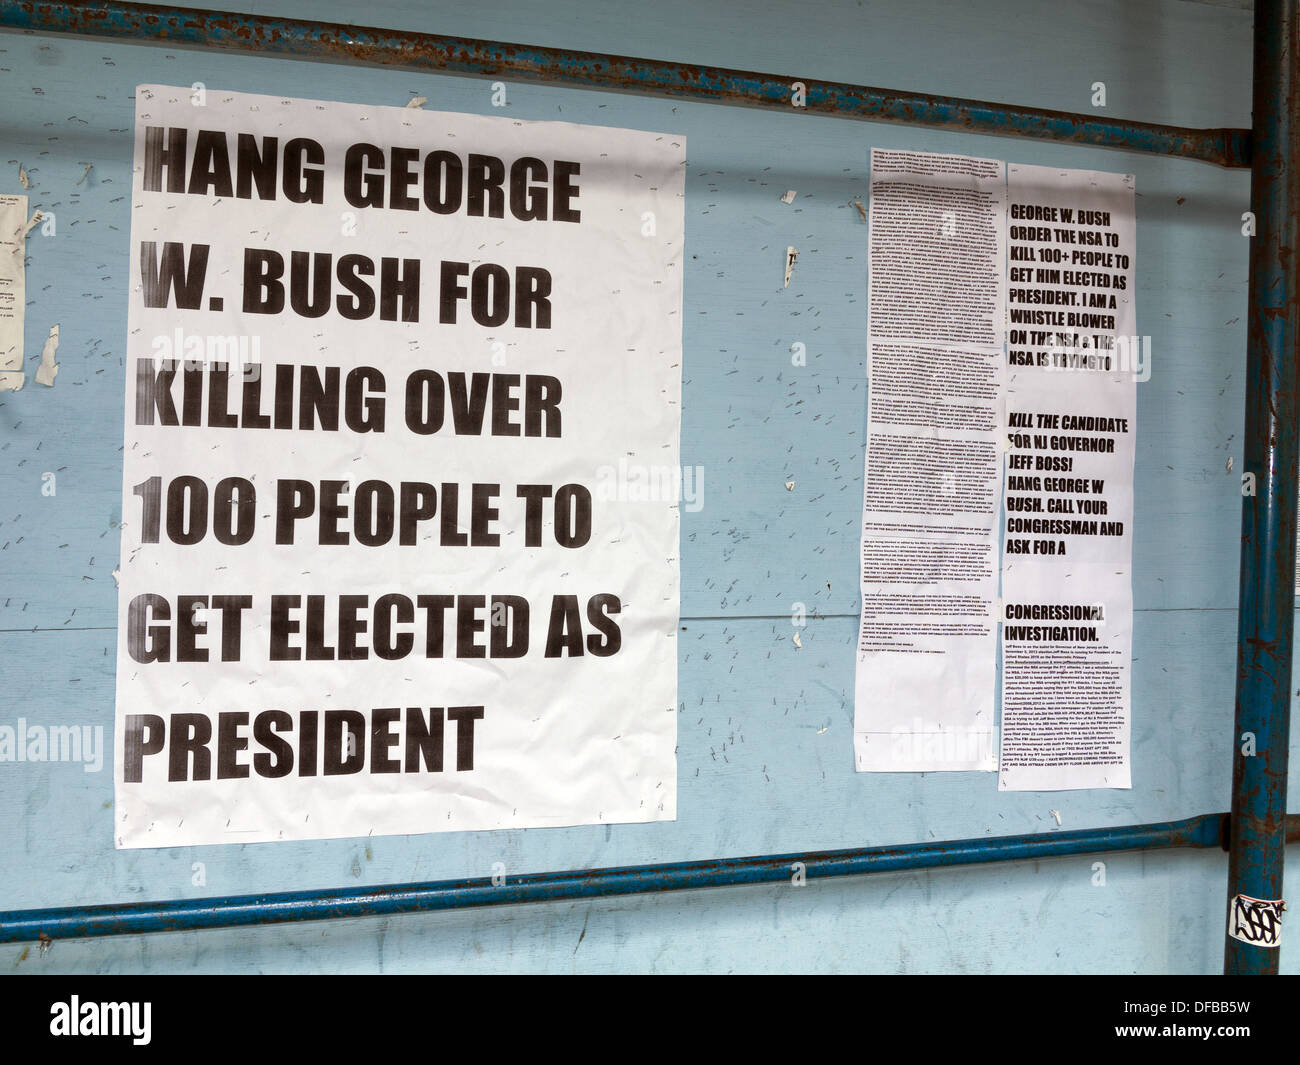 Incendiary, Anti-Bush propaganda on E.125th St. wall in the Harlem section of NYC, NY, 2013. - Stock Image